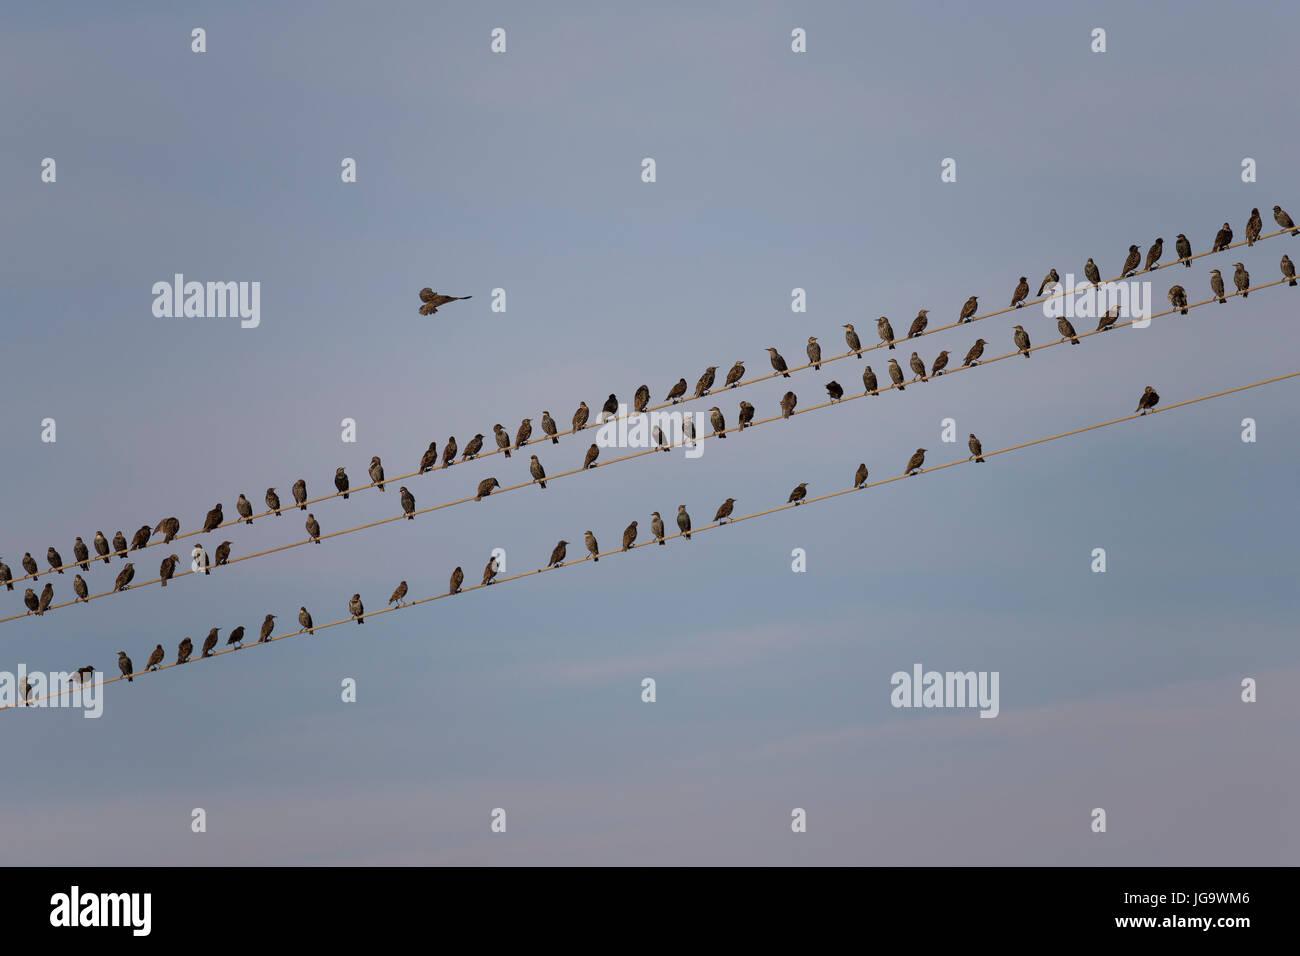 Star, Stare, Trupp, Schwarm, Starenschwarm, Sturnus vulgaris, European starling, common starling, L'Étourneau sansonnet Stock Photo